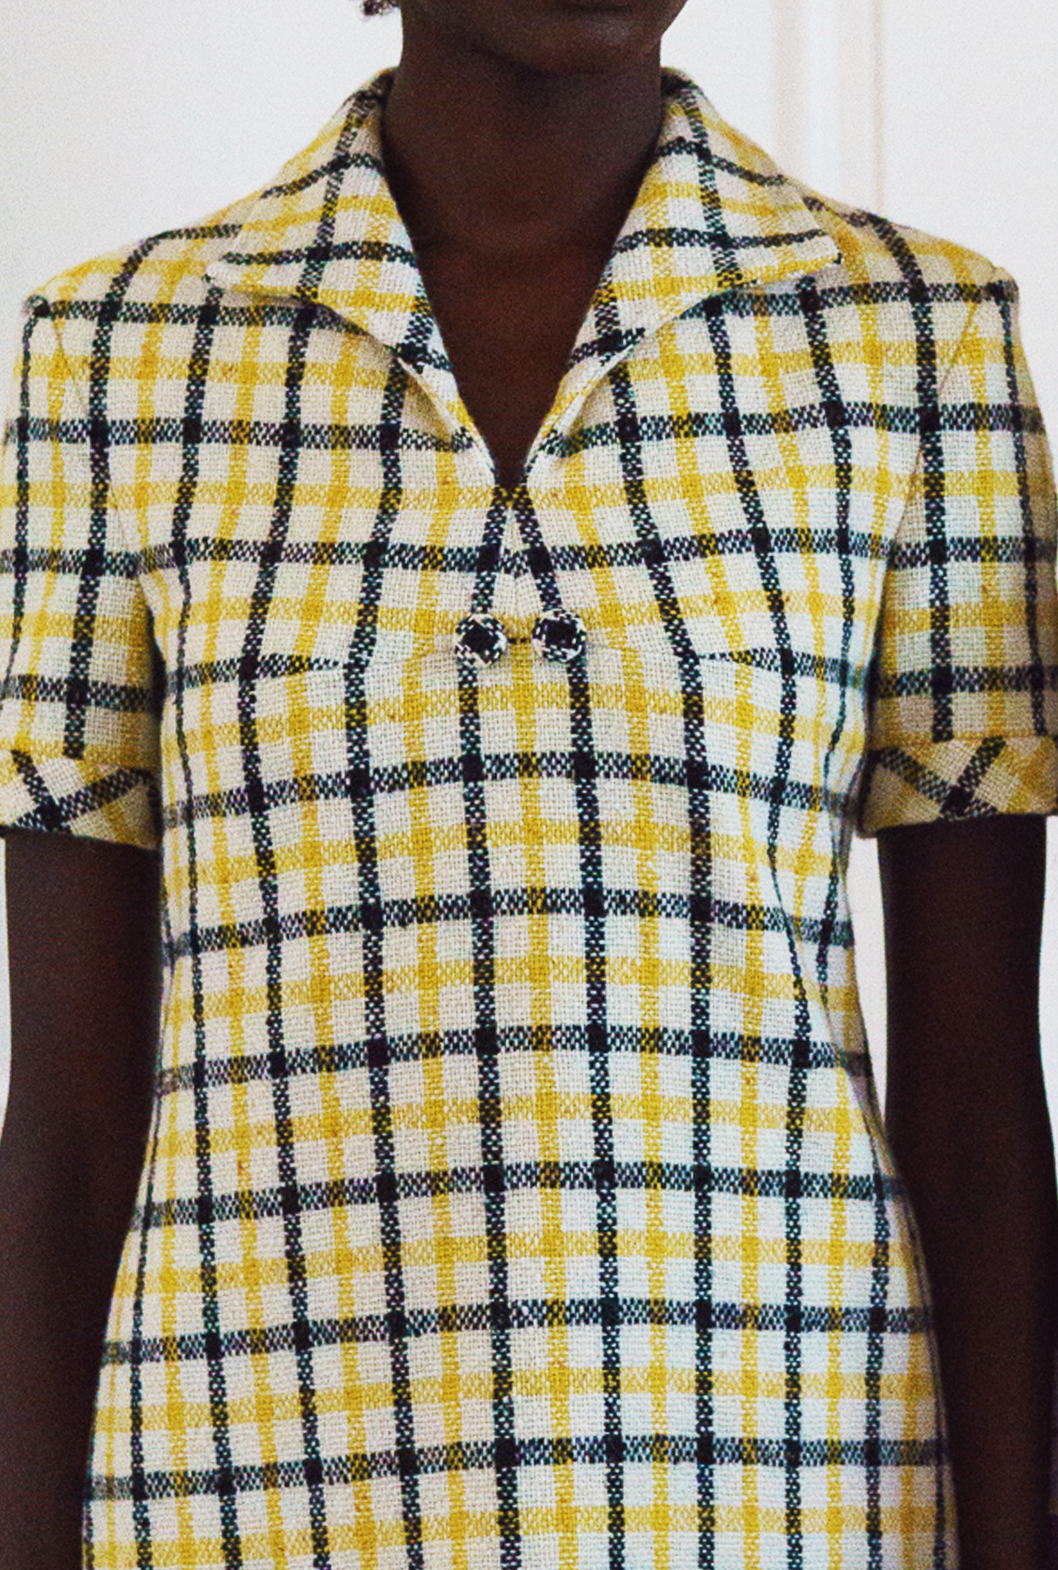 8 M Yellow Plaid Shift Dress Detail.png